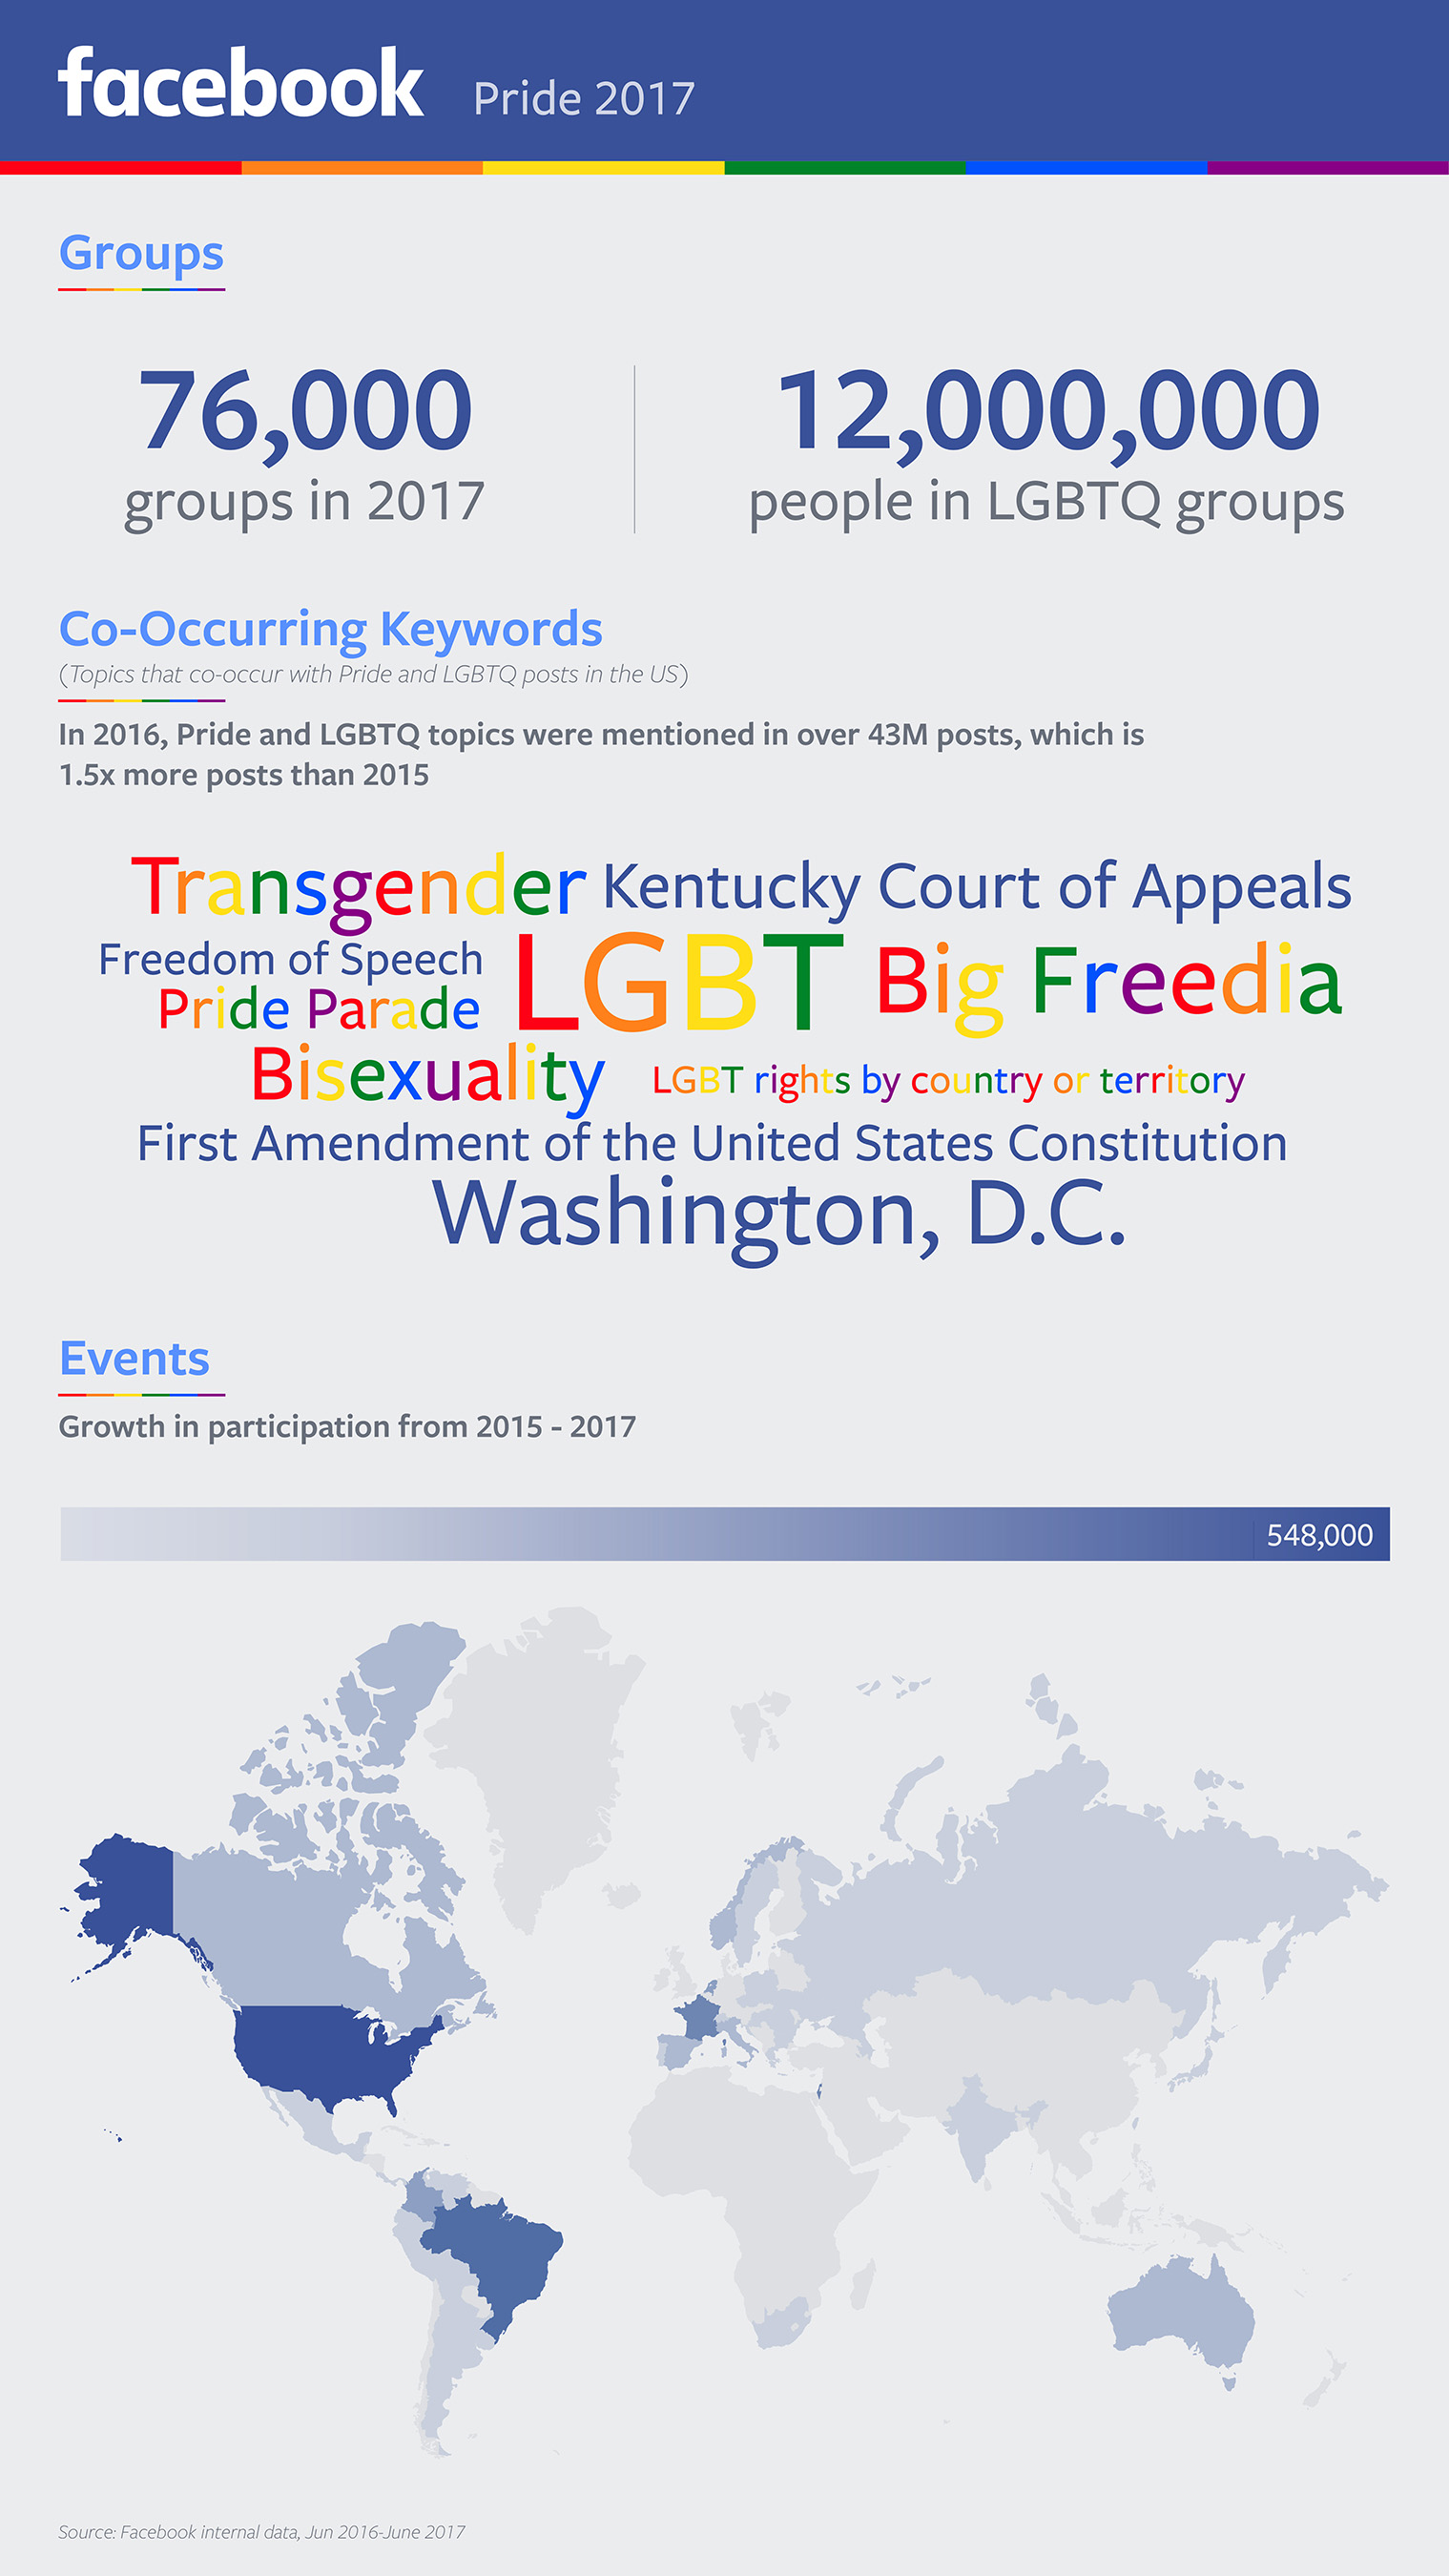 Pride 2017 Infographic